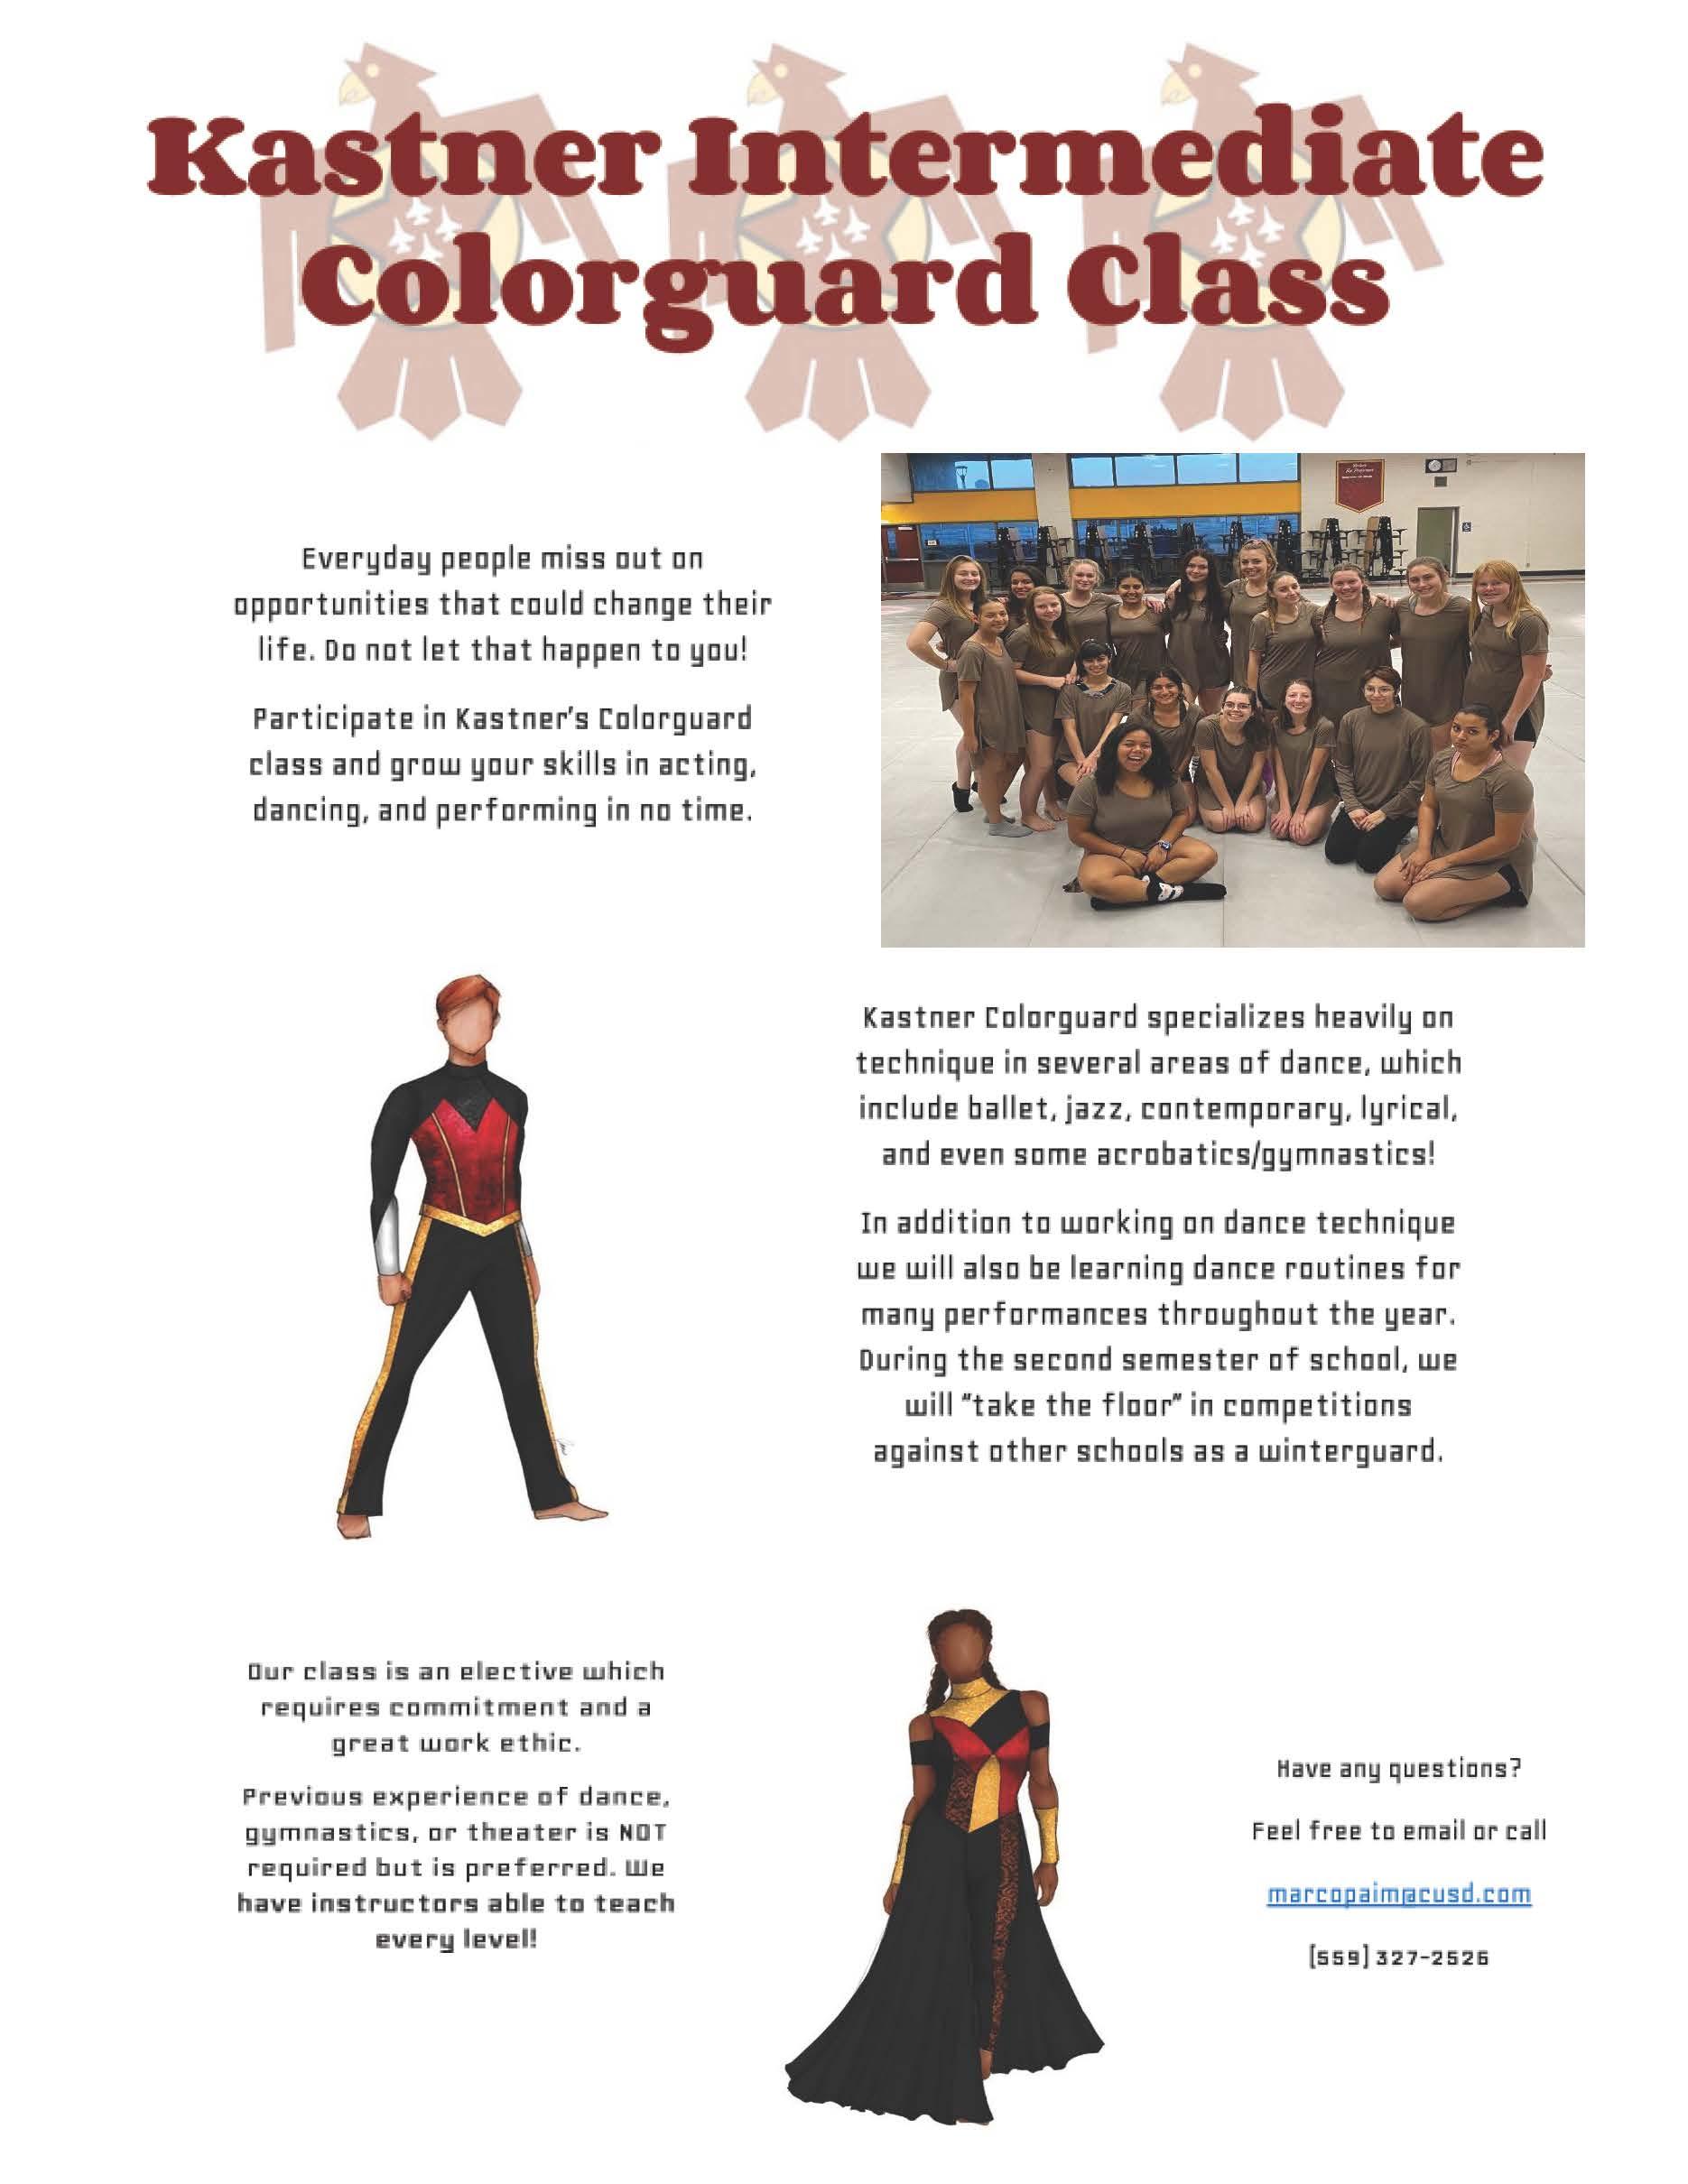 color guard class